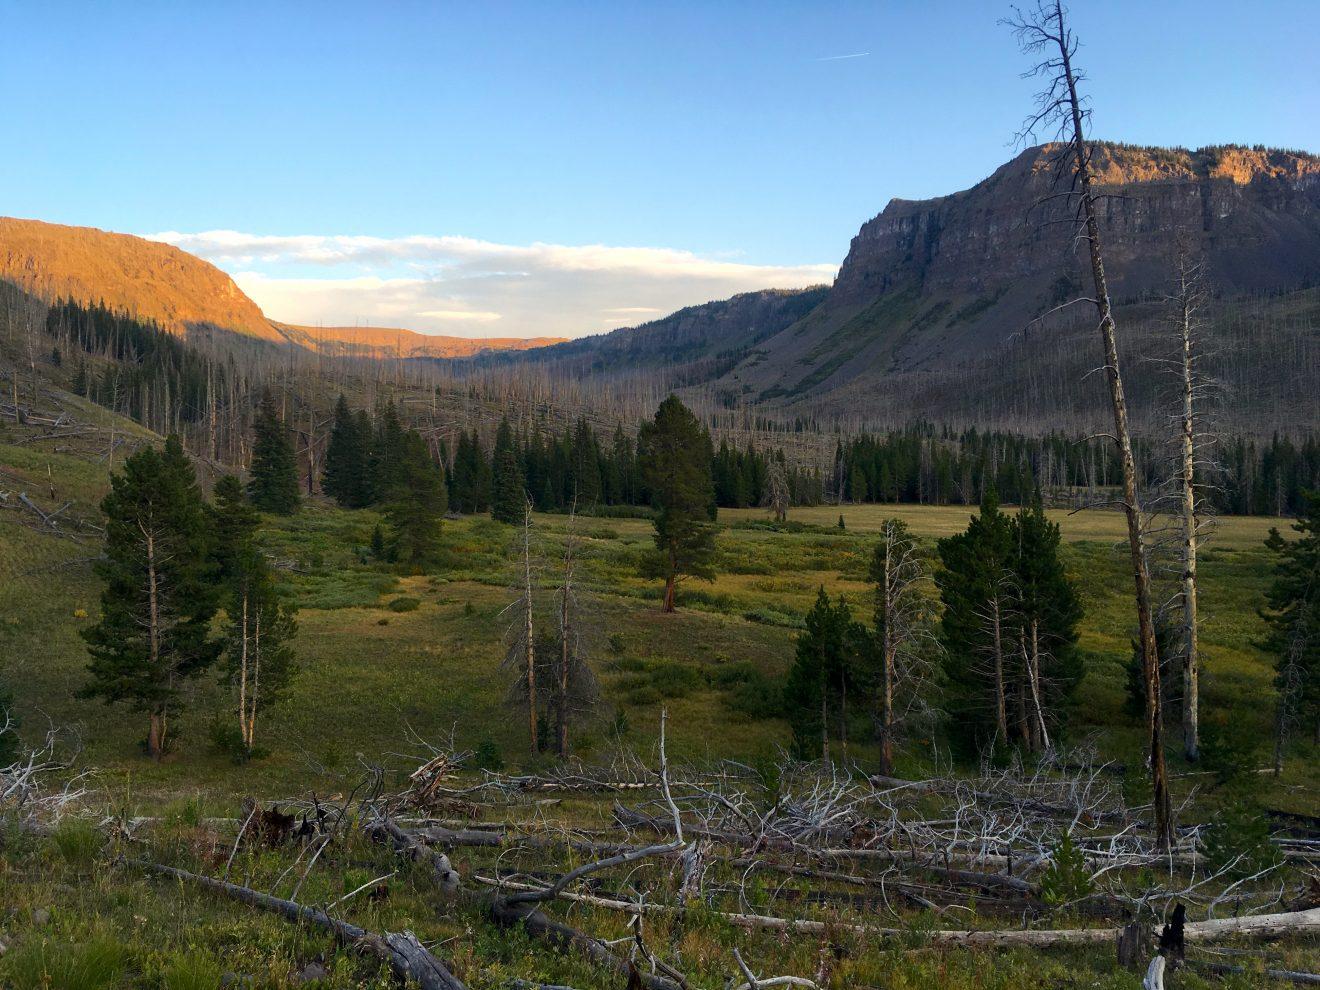 Chinese Wall Loop, Flat Tops Wilderness, Colorado